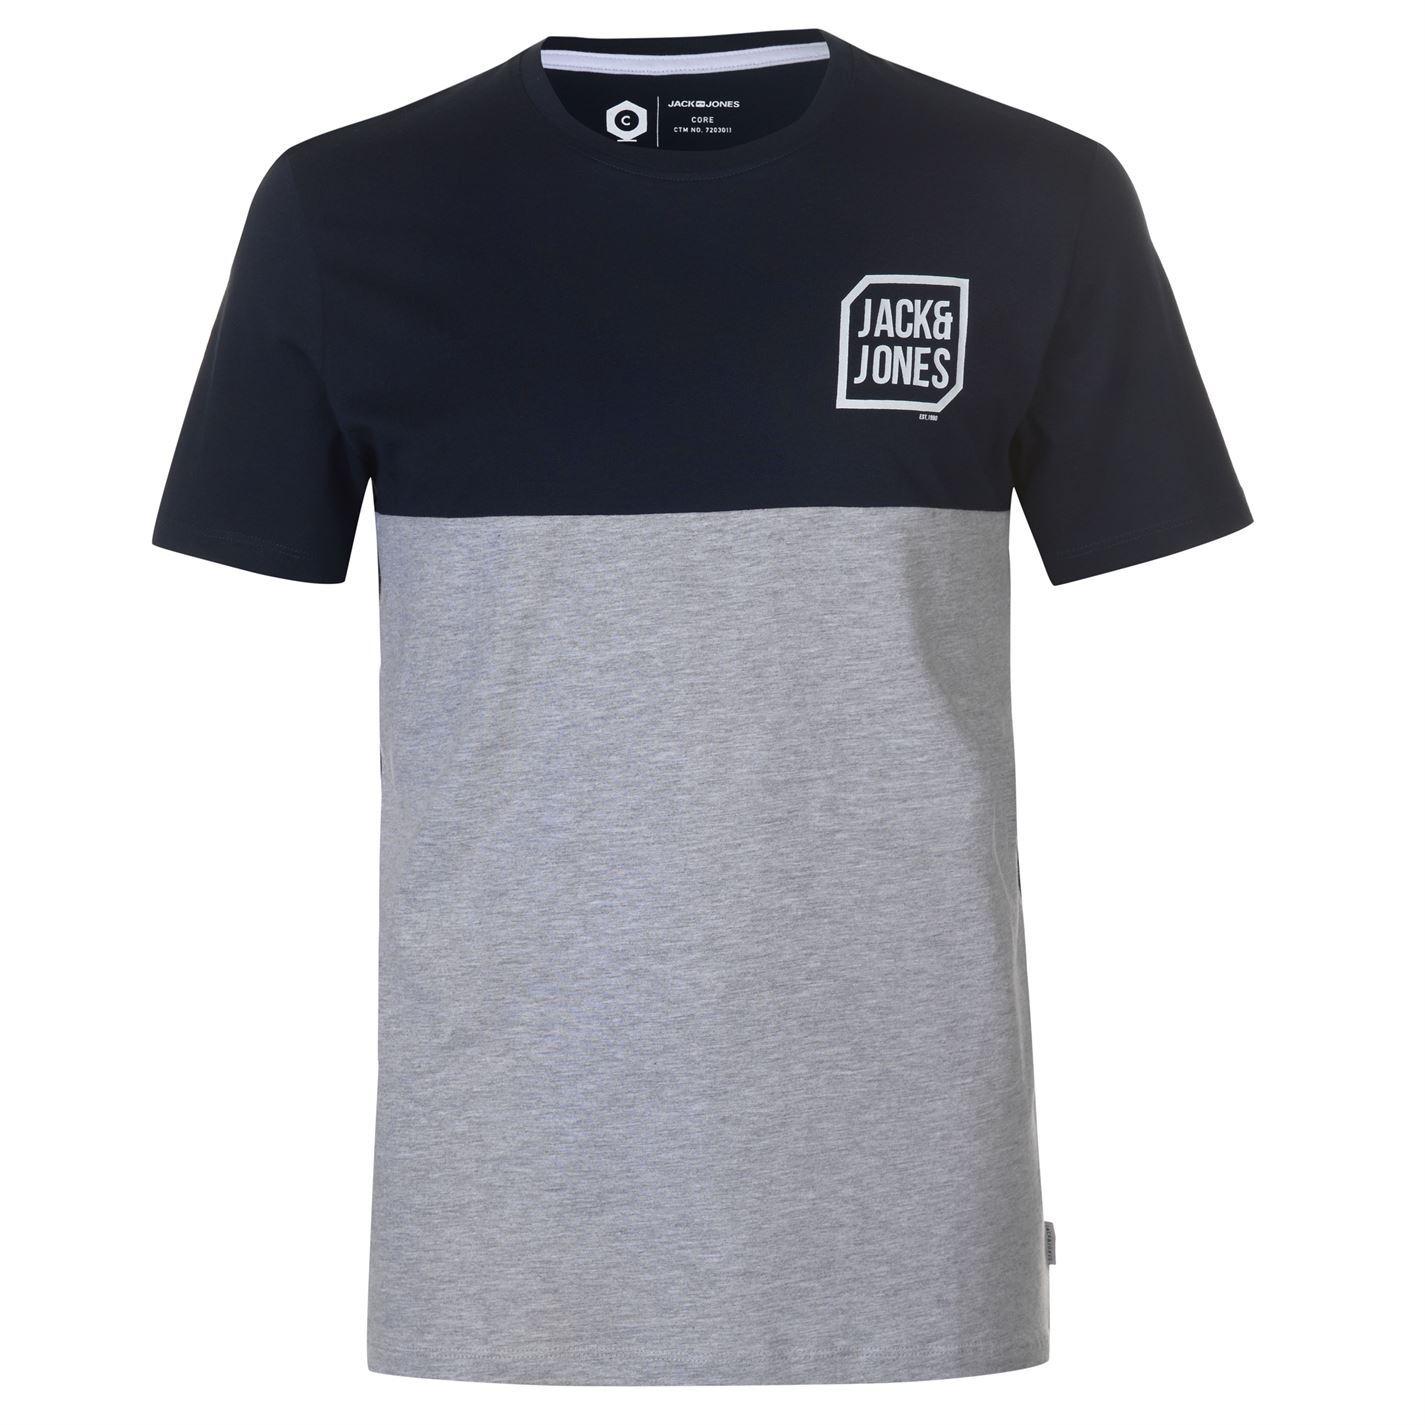 Jack-and-Jones-Core-Tern-T-Shirt-Mens-Tee-Shirt-Top thumbnail 4